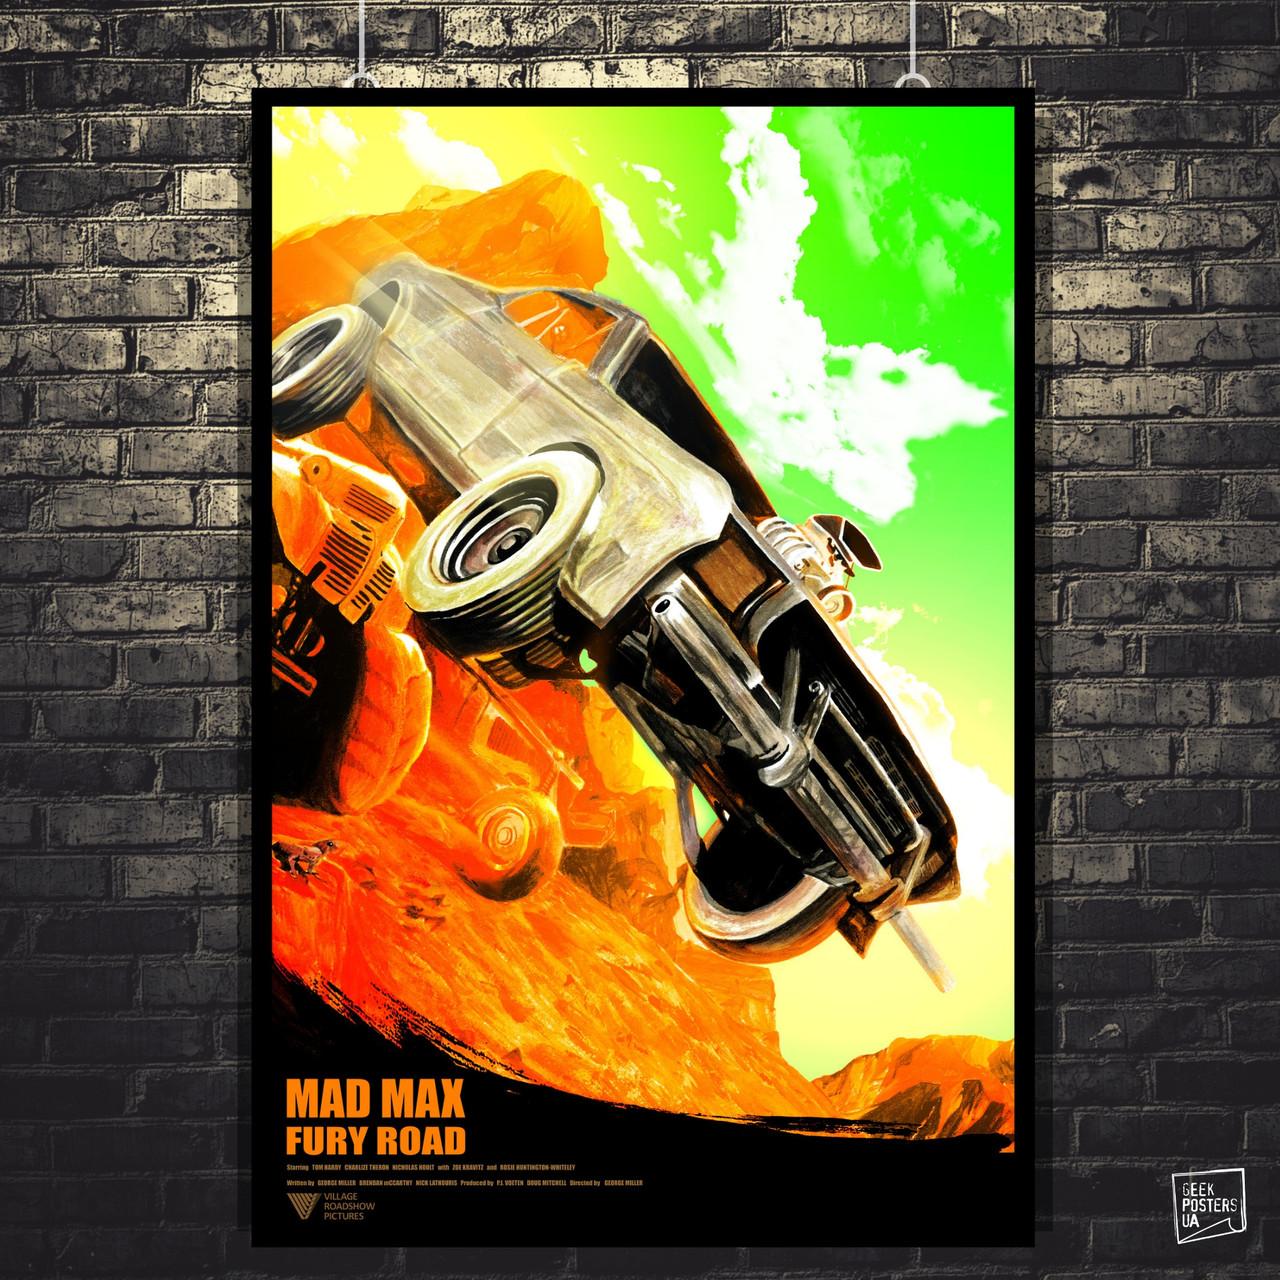 Постер Max Max: Fury Road, Безумный Макс: Дорога ярости. Размер 60x40см (A2). Глянцевая бумага